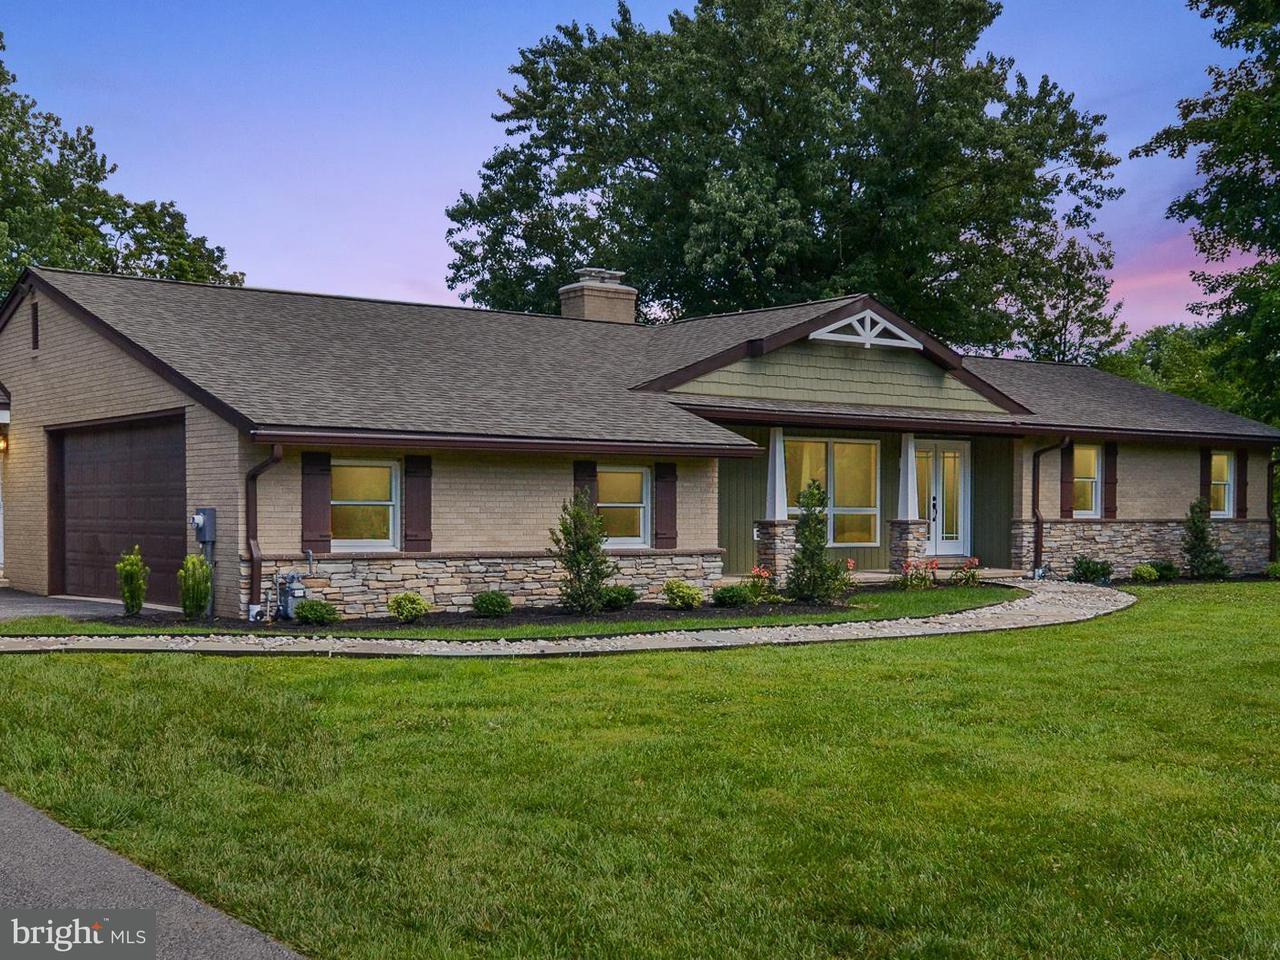 独户住宅 为 销售 在 12421 MANOR Road 12421 MANOR Road Glen Arm, 马里兰州 21057 美国